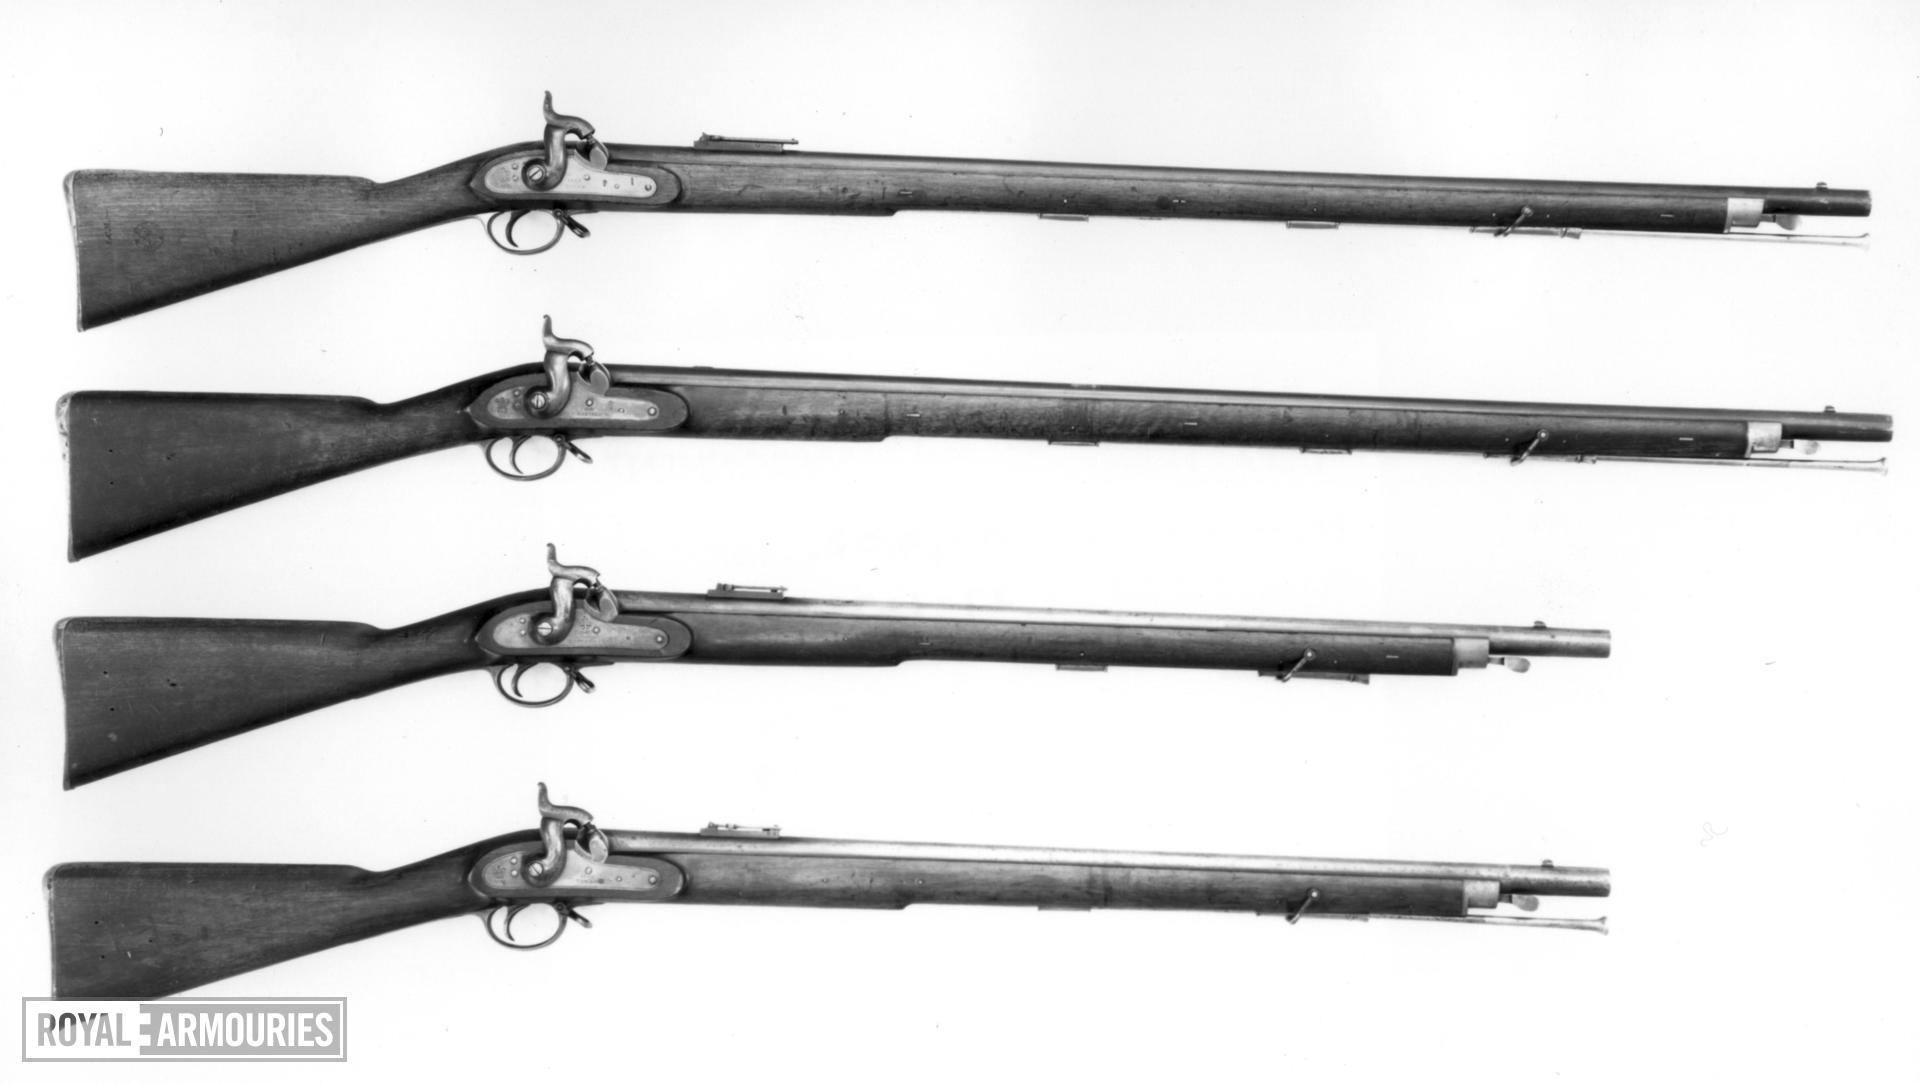 Percussion muzzle-loading military rifle-musket - Pattern 1842 Sea Service